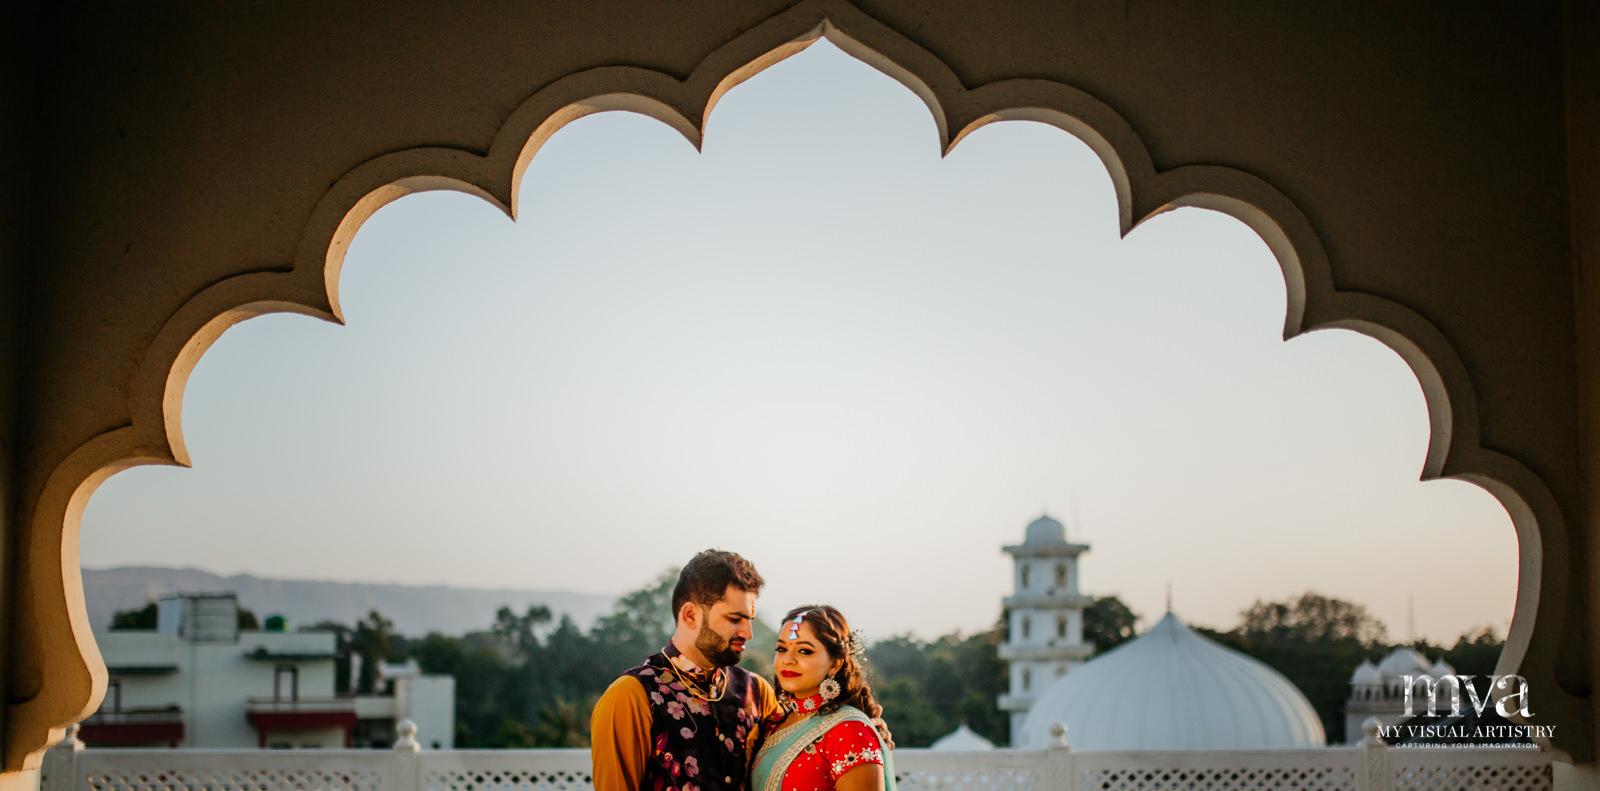 0440 -Vani_Sarang_ Photographer_My Visual Artistry_Wedding_MVA_Destination-7265.jpg